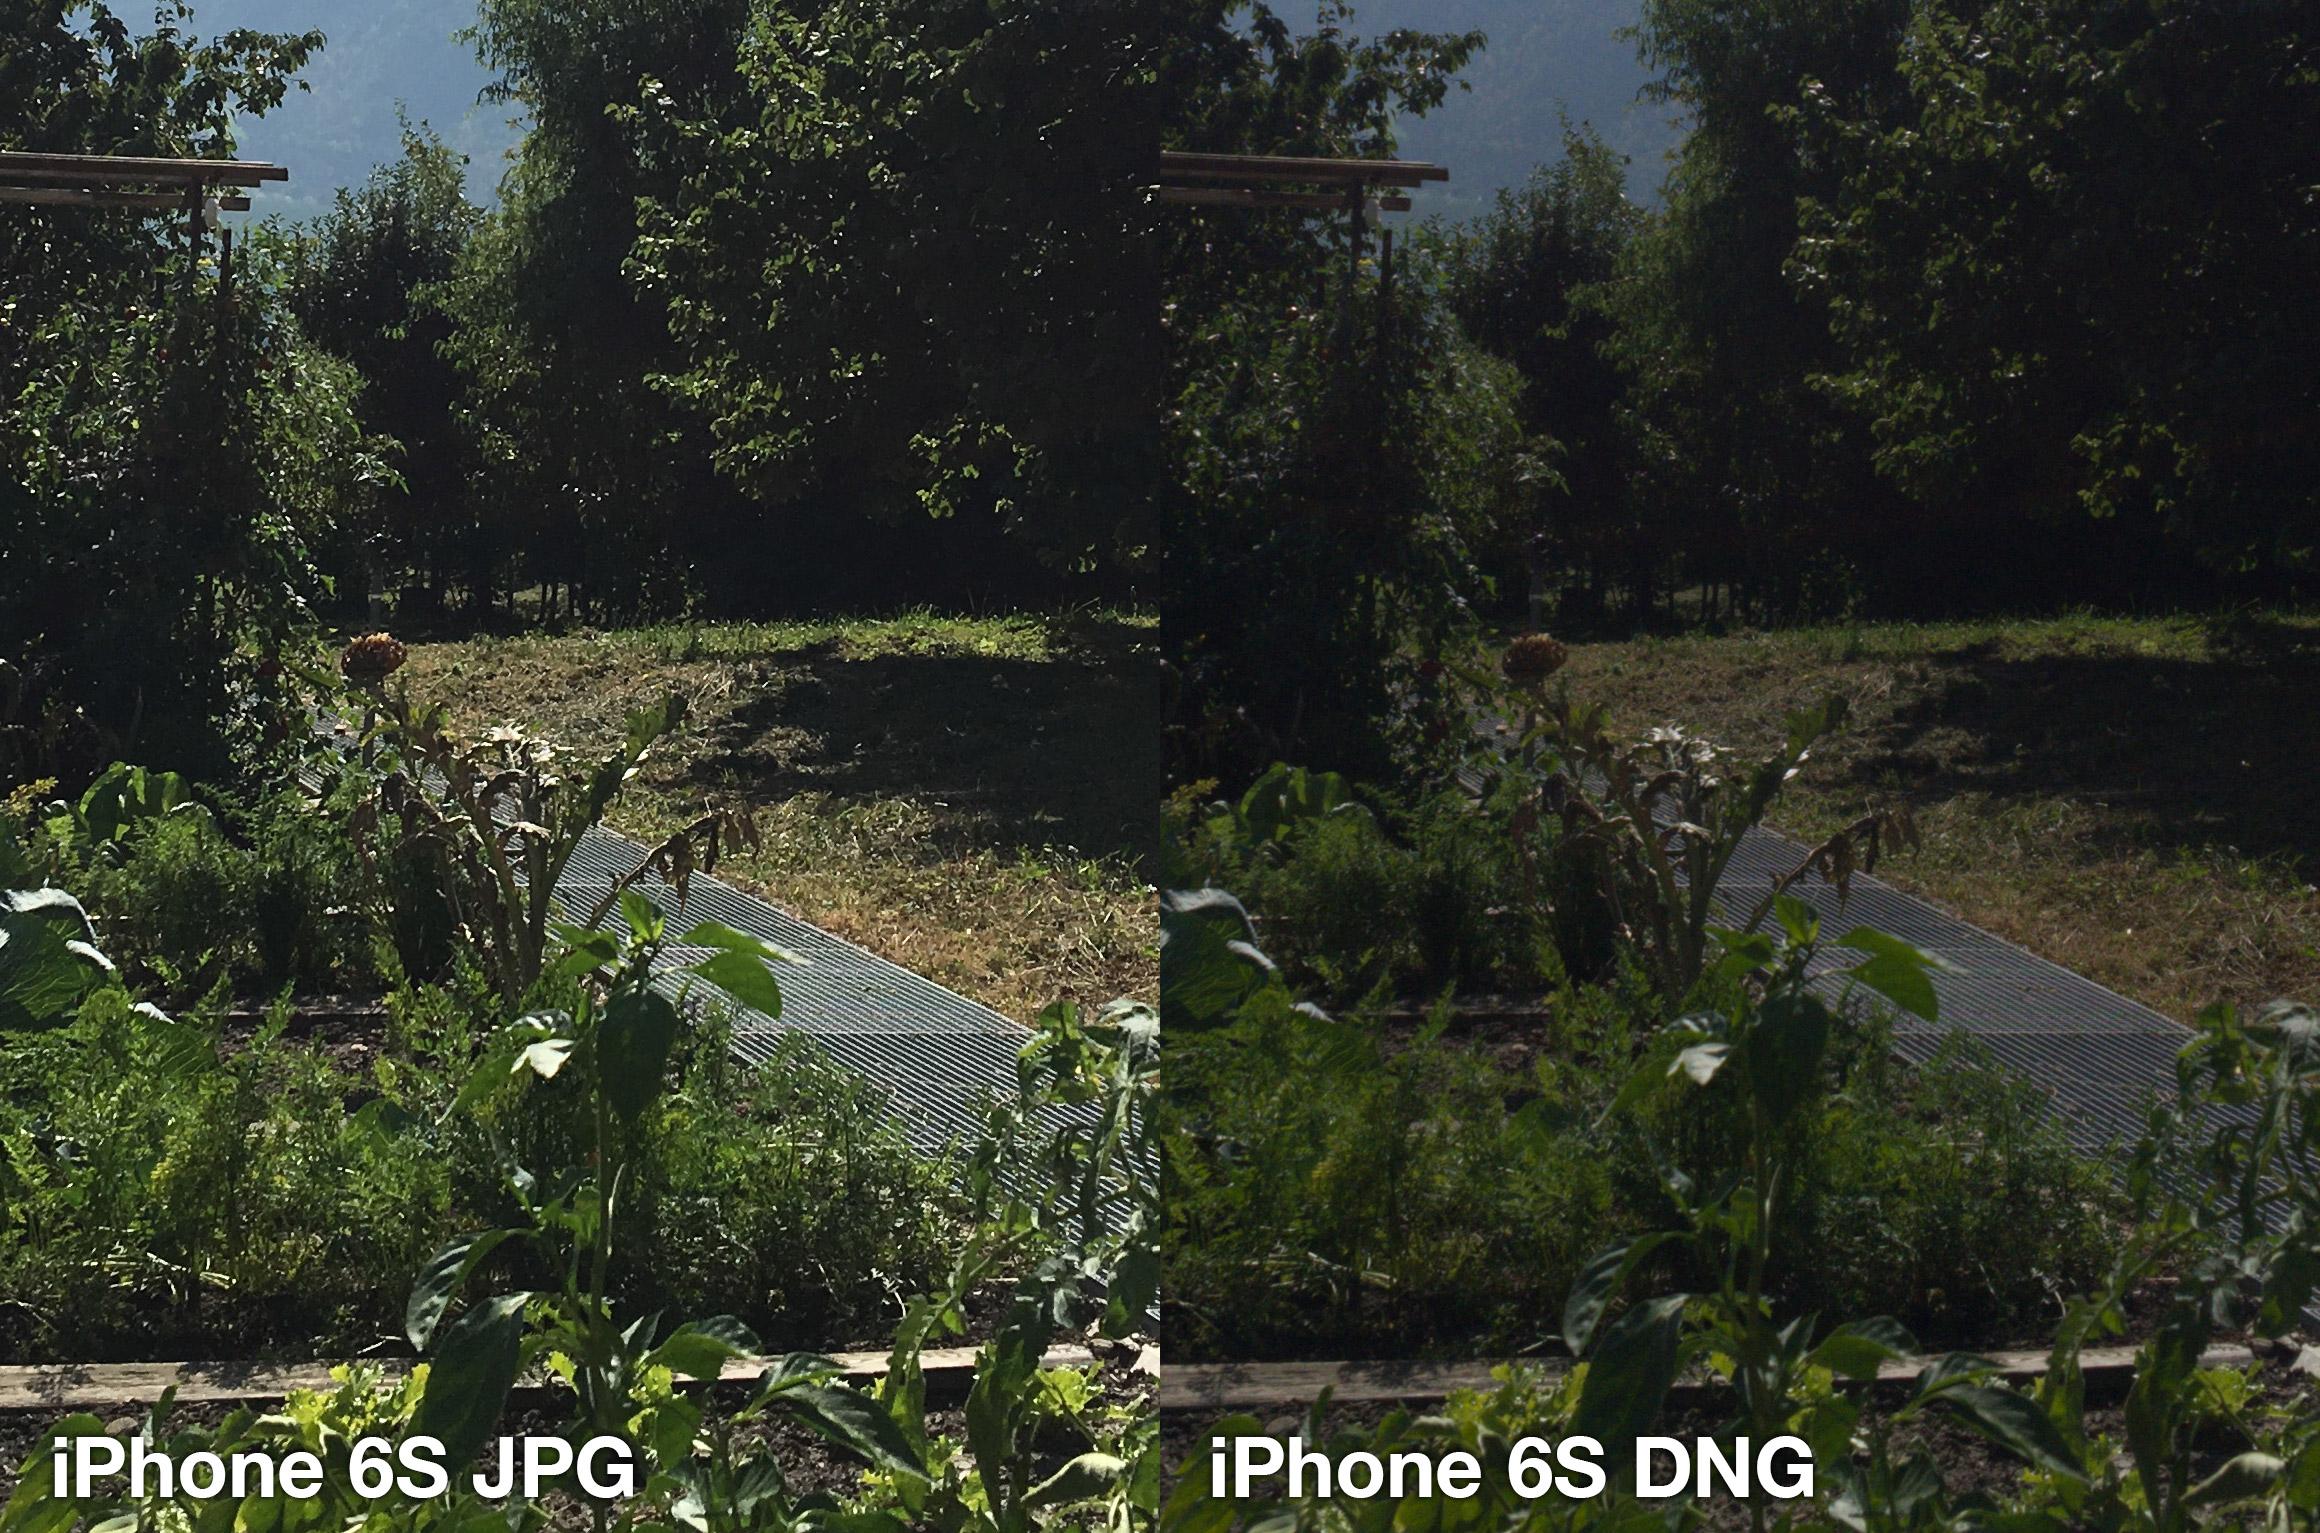 iphone-6s-lightroom-jpg-vs-dng-6